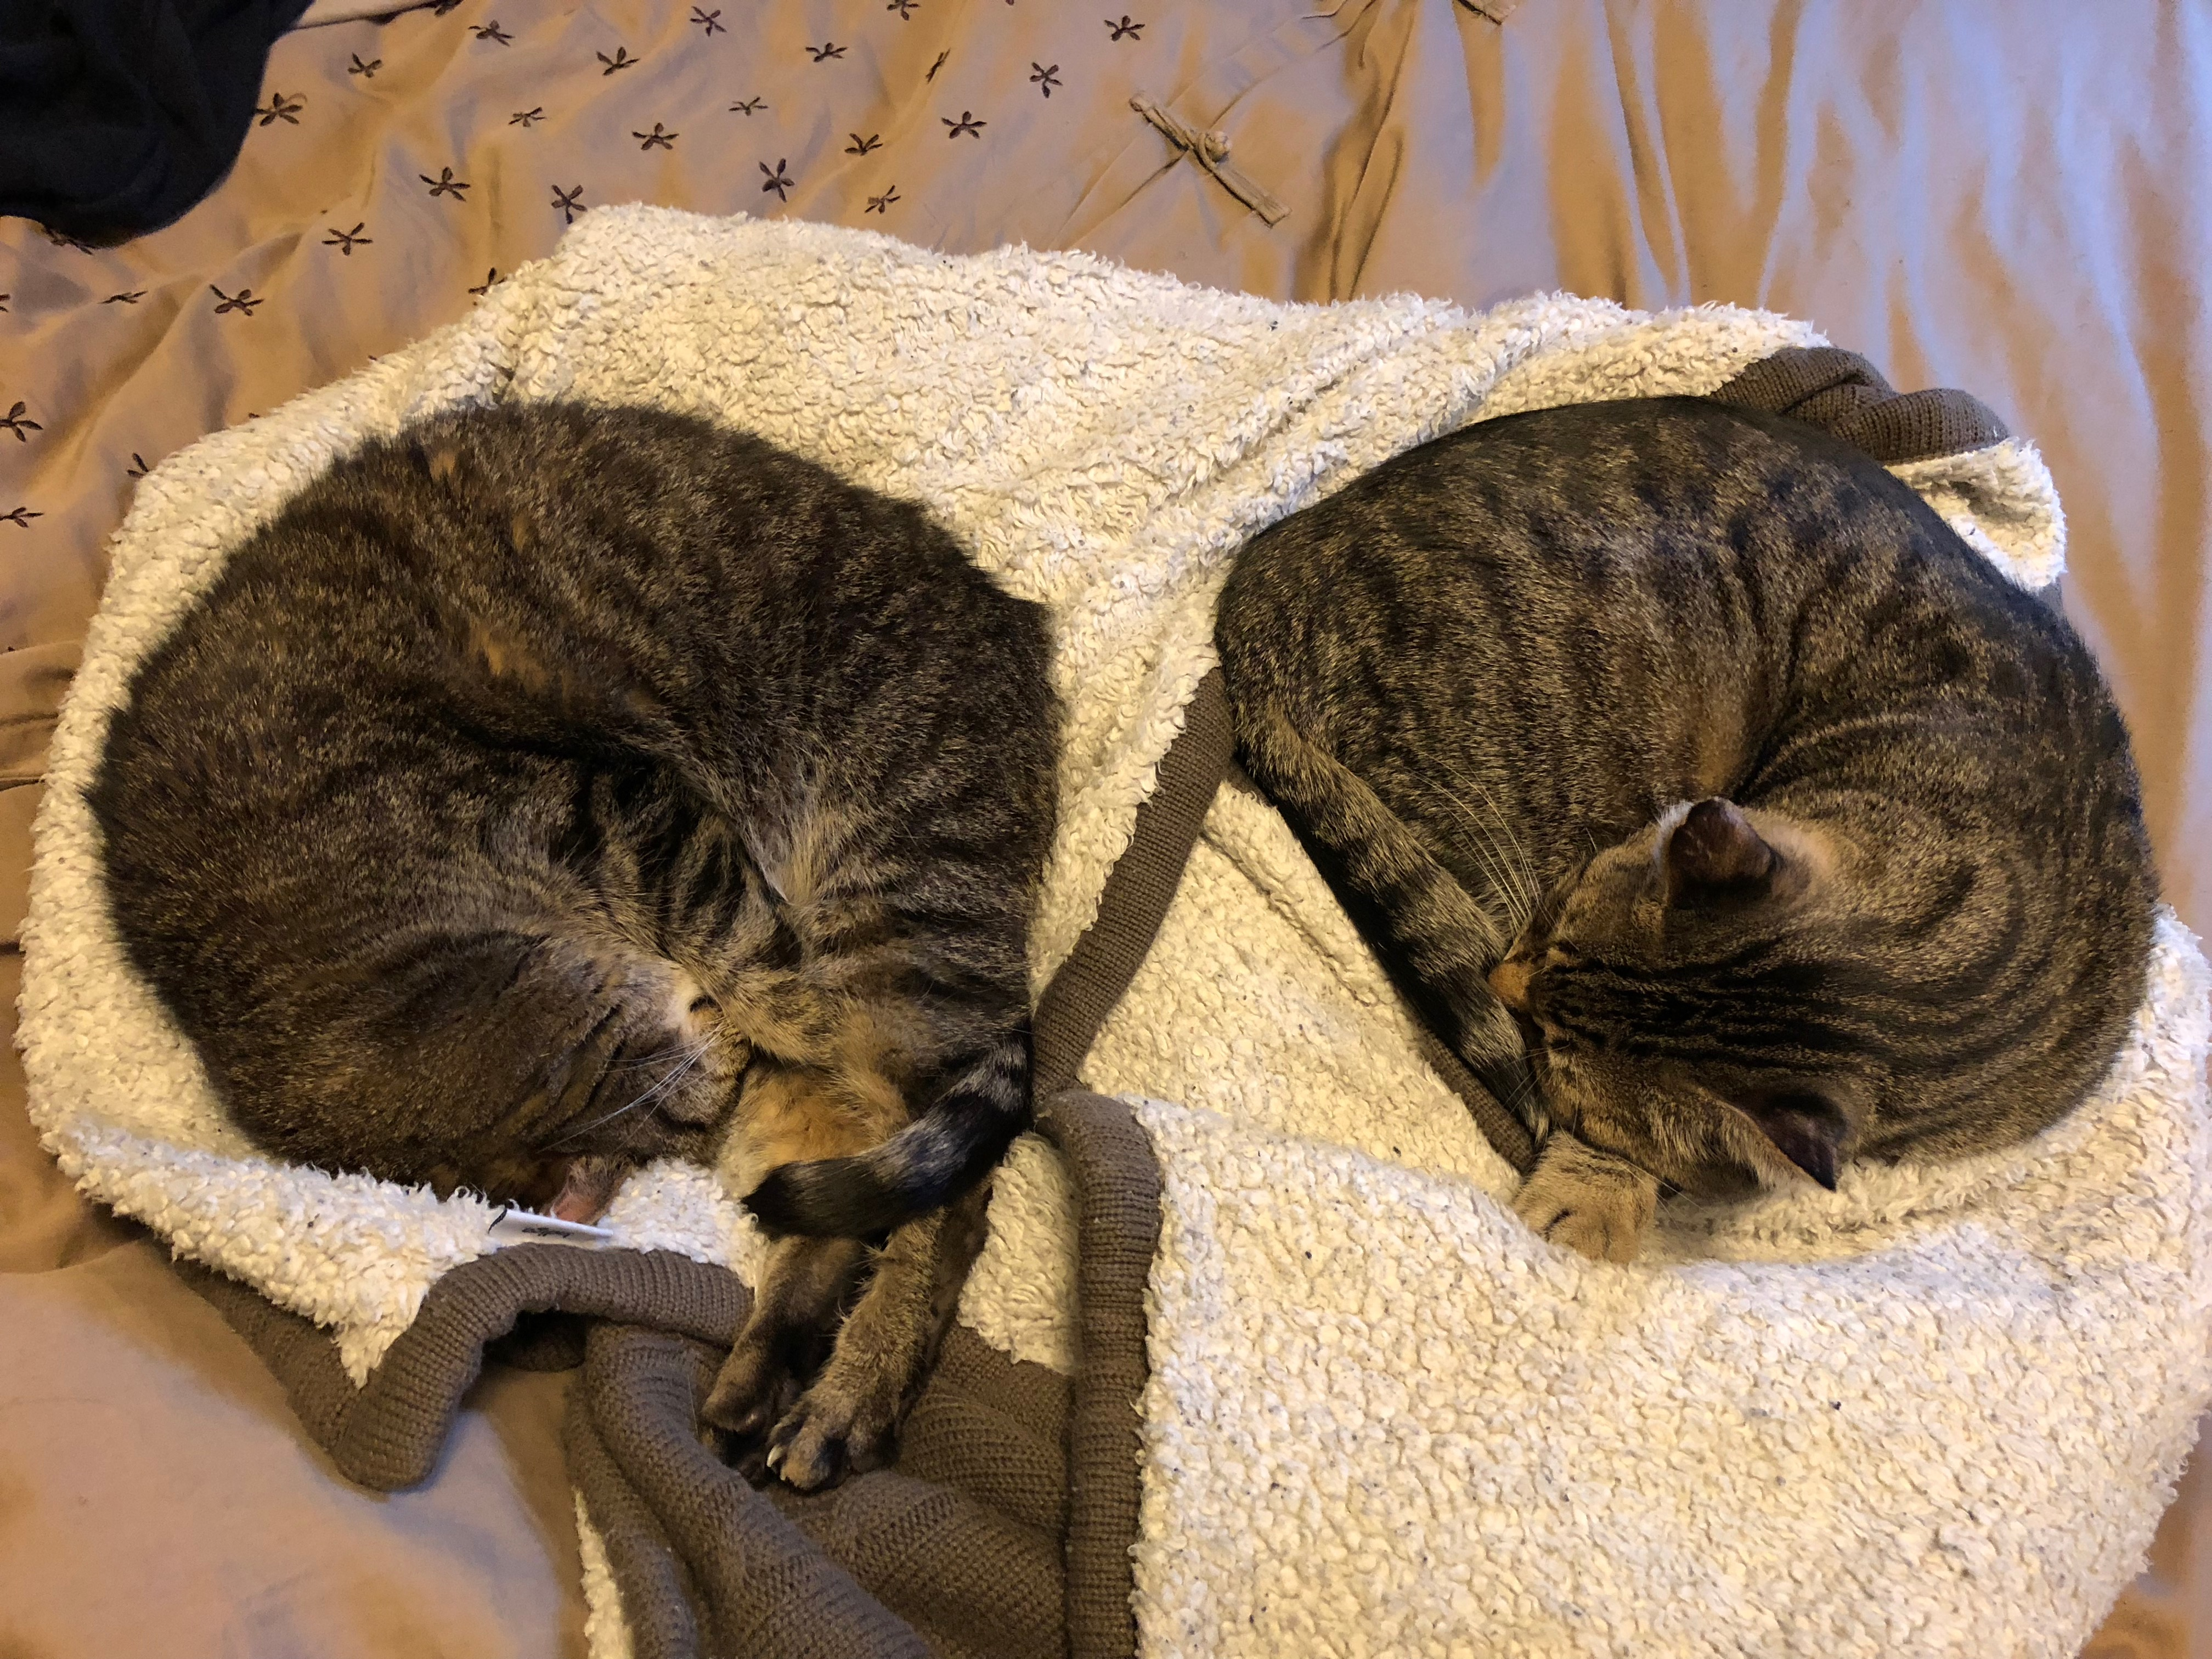 Cozy kitties